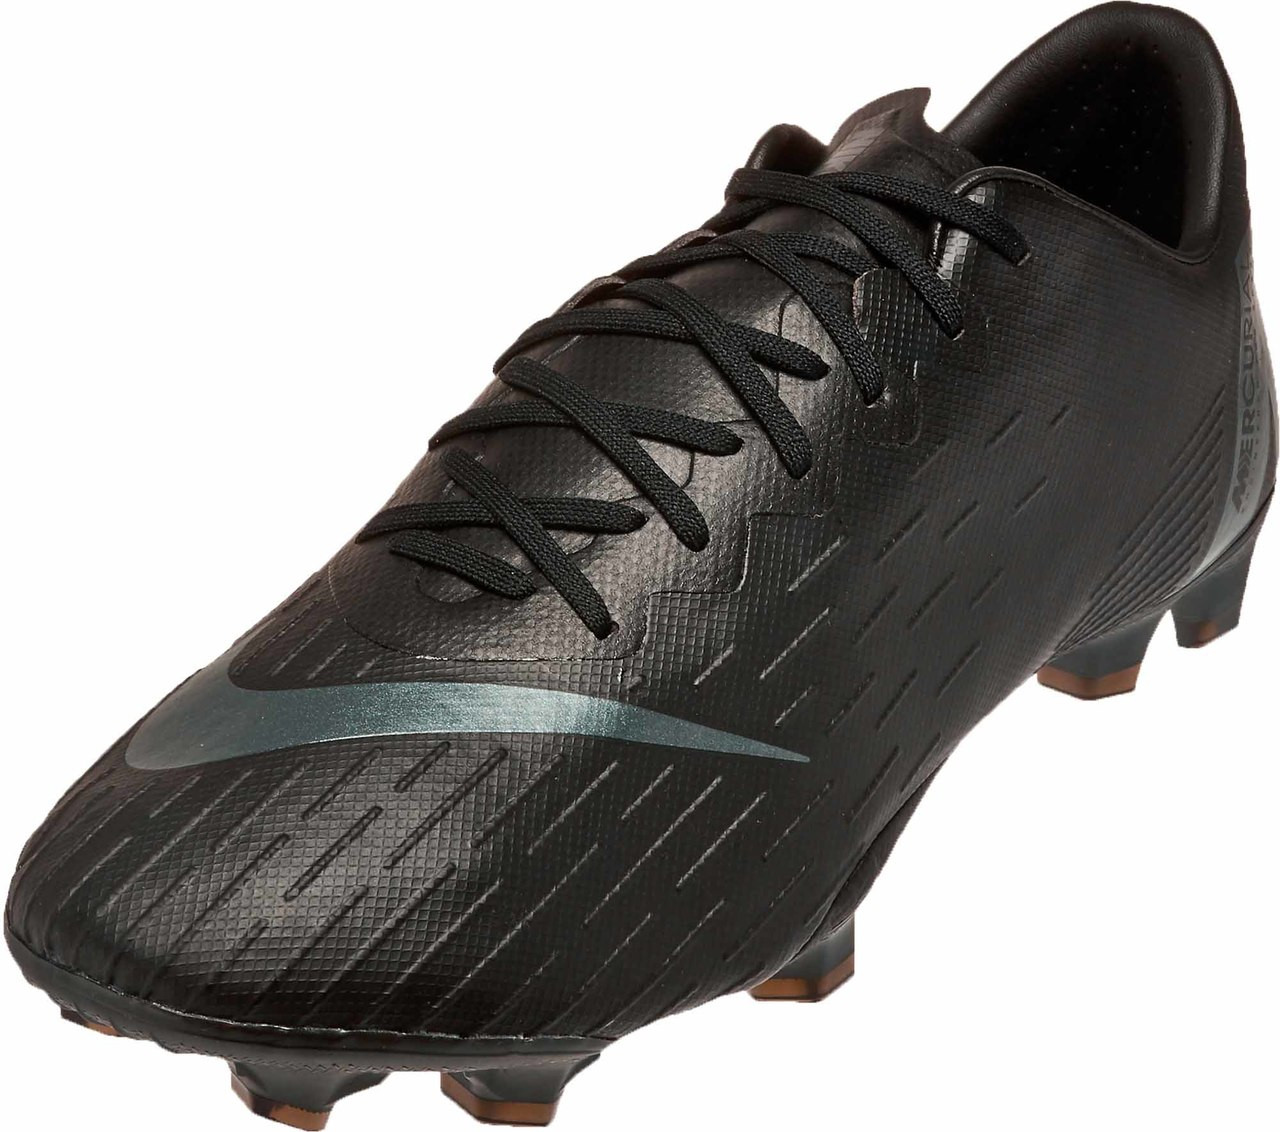 a3cdc2ff1 Nike Vapor 12 Pro FG - Black Black (10518) - ohp soccer